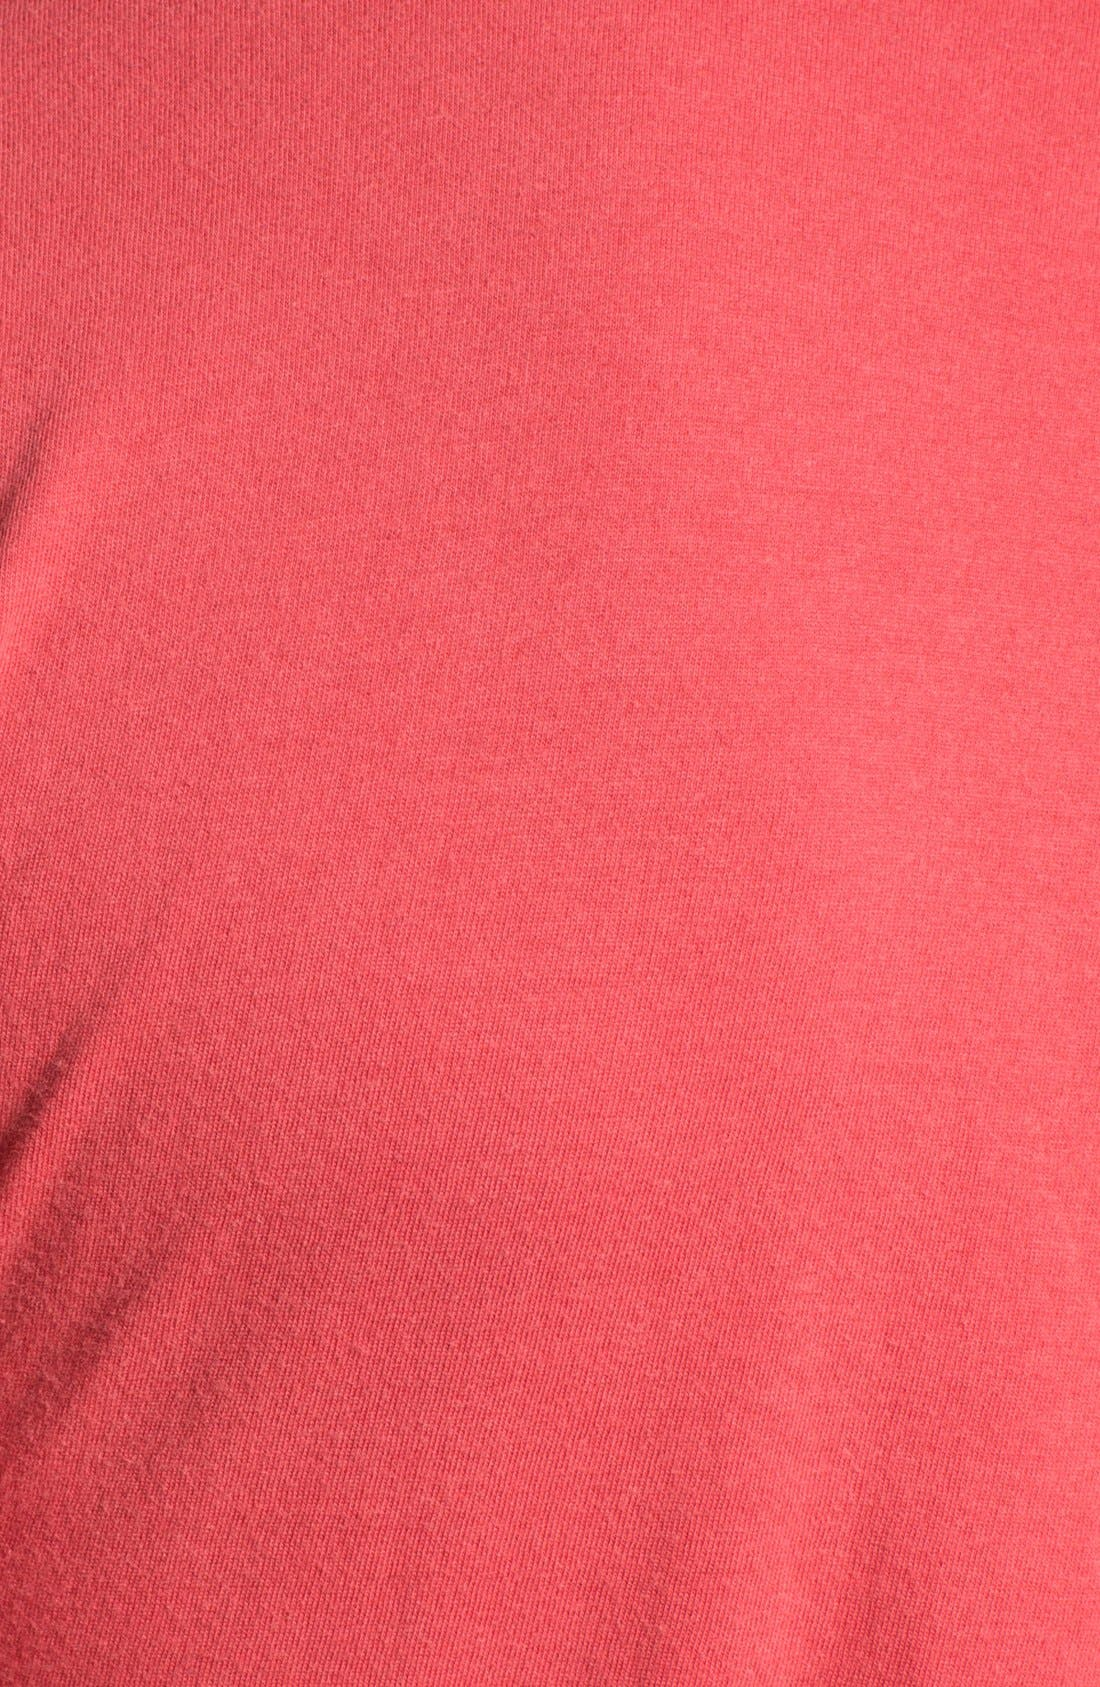 'Texas Rangers' T-Shirt,                             Alternate thumbnail 3, color,                             600